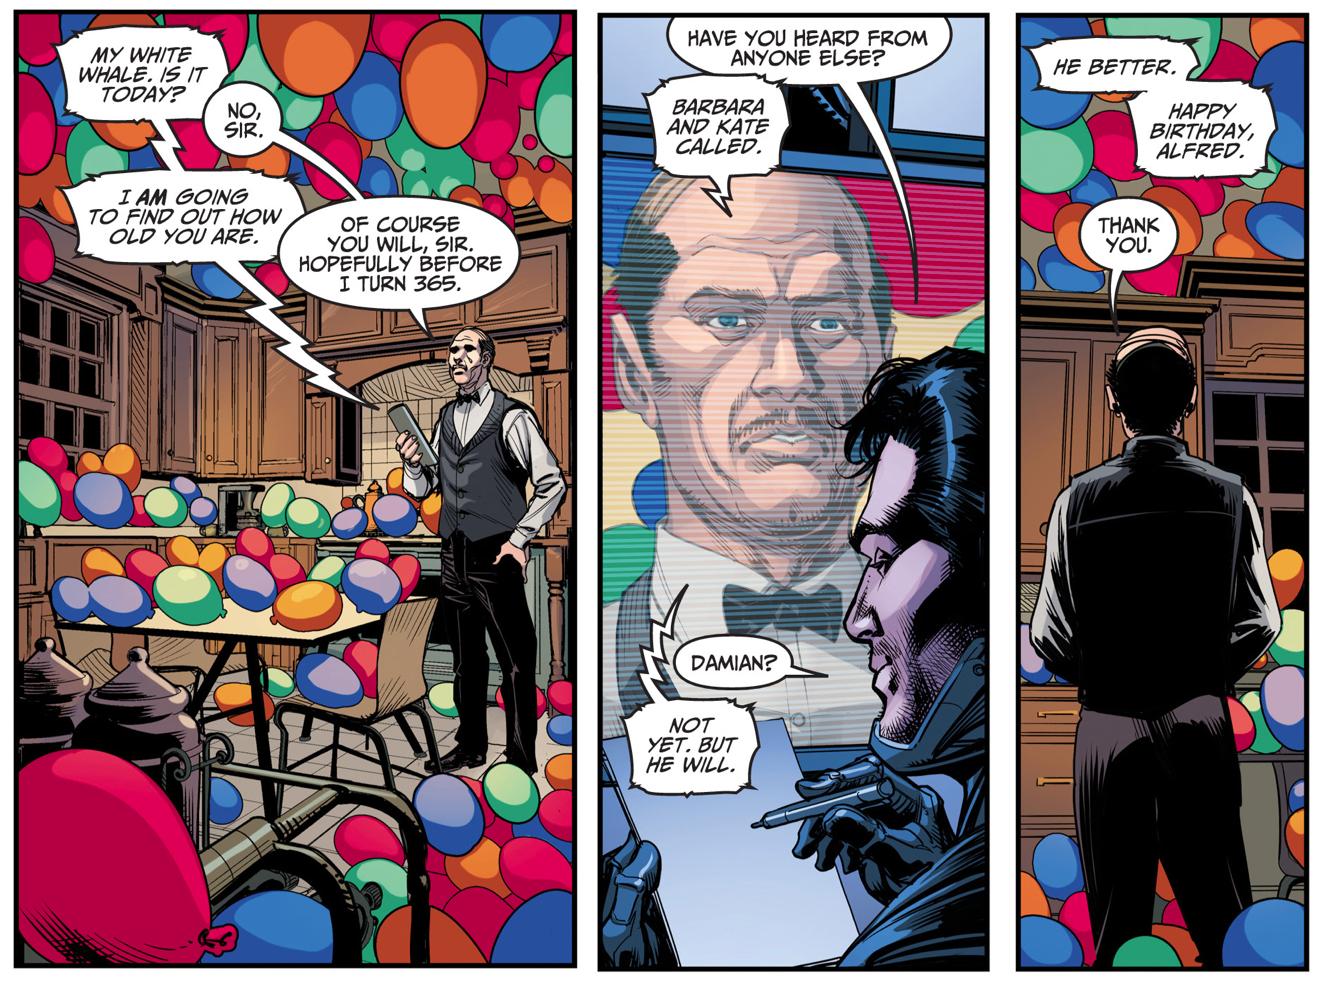 Batman Celebrates Alfred Pennyworth's Birthday (Injustice Gods Among Us)